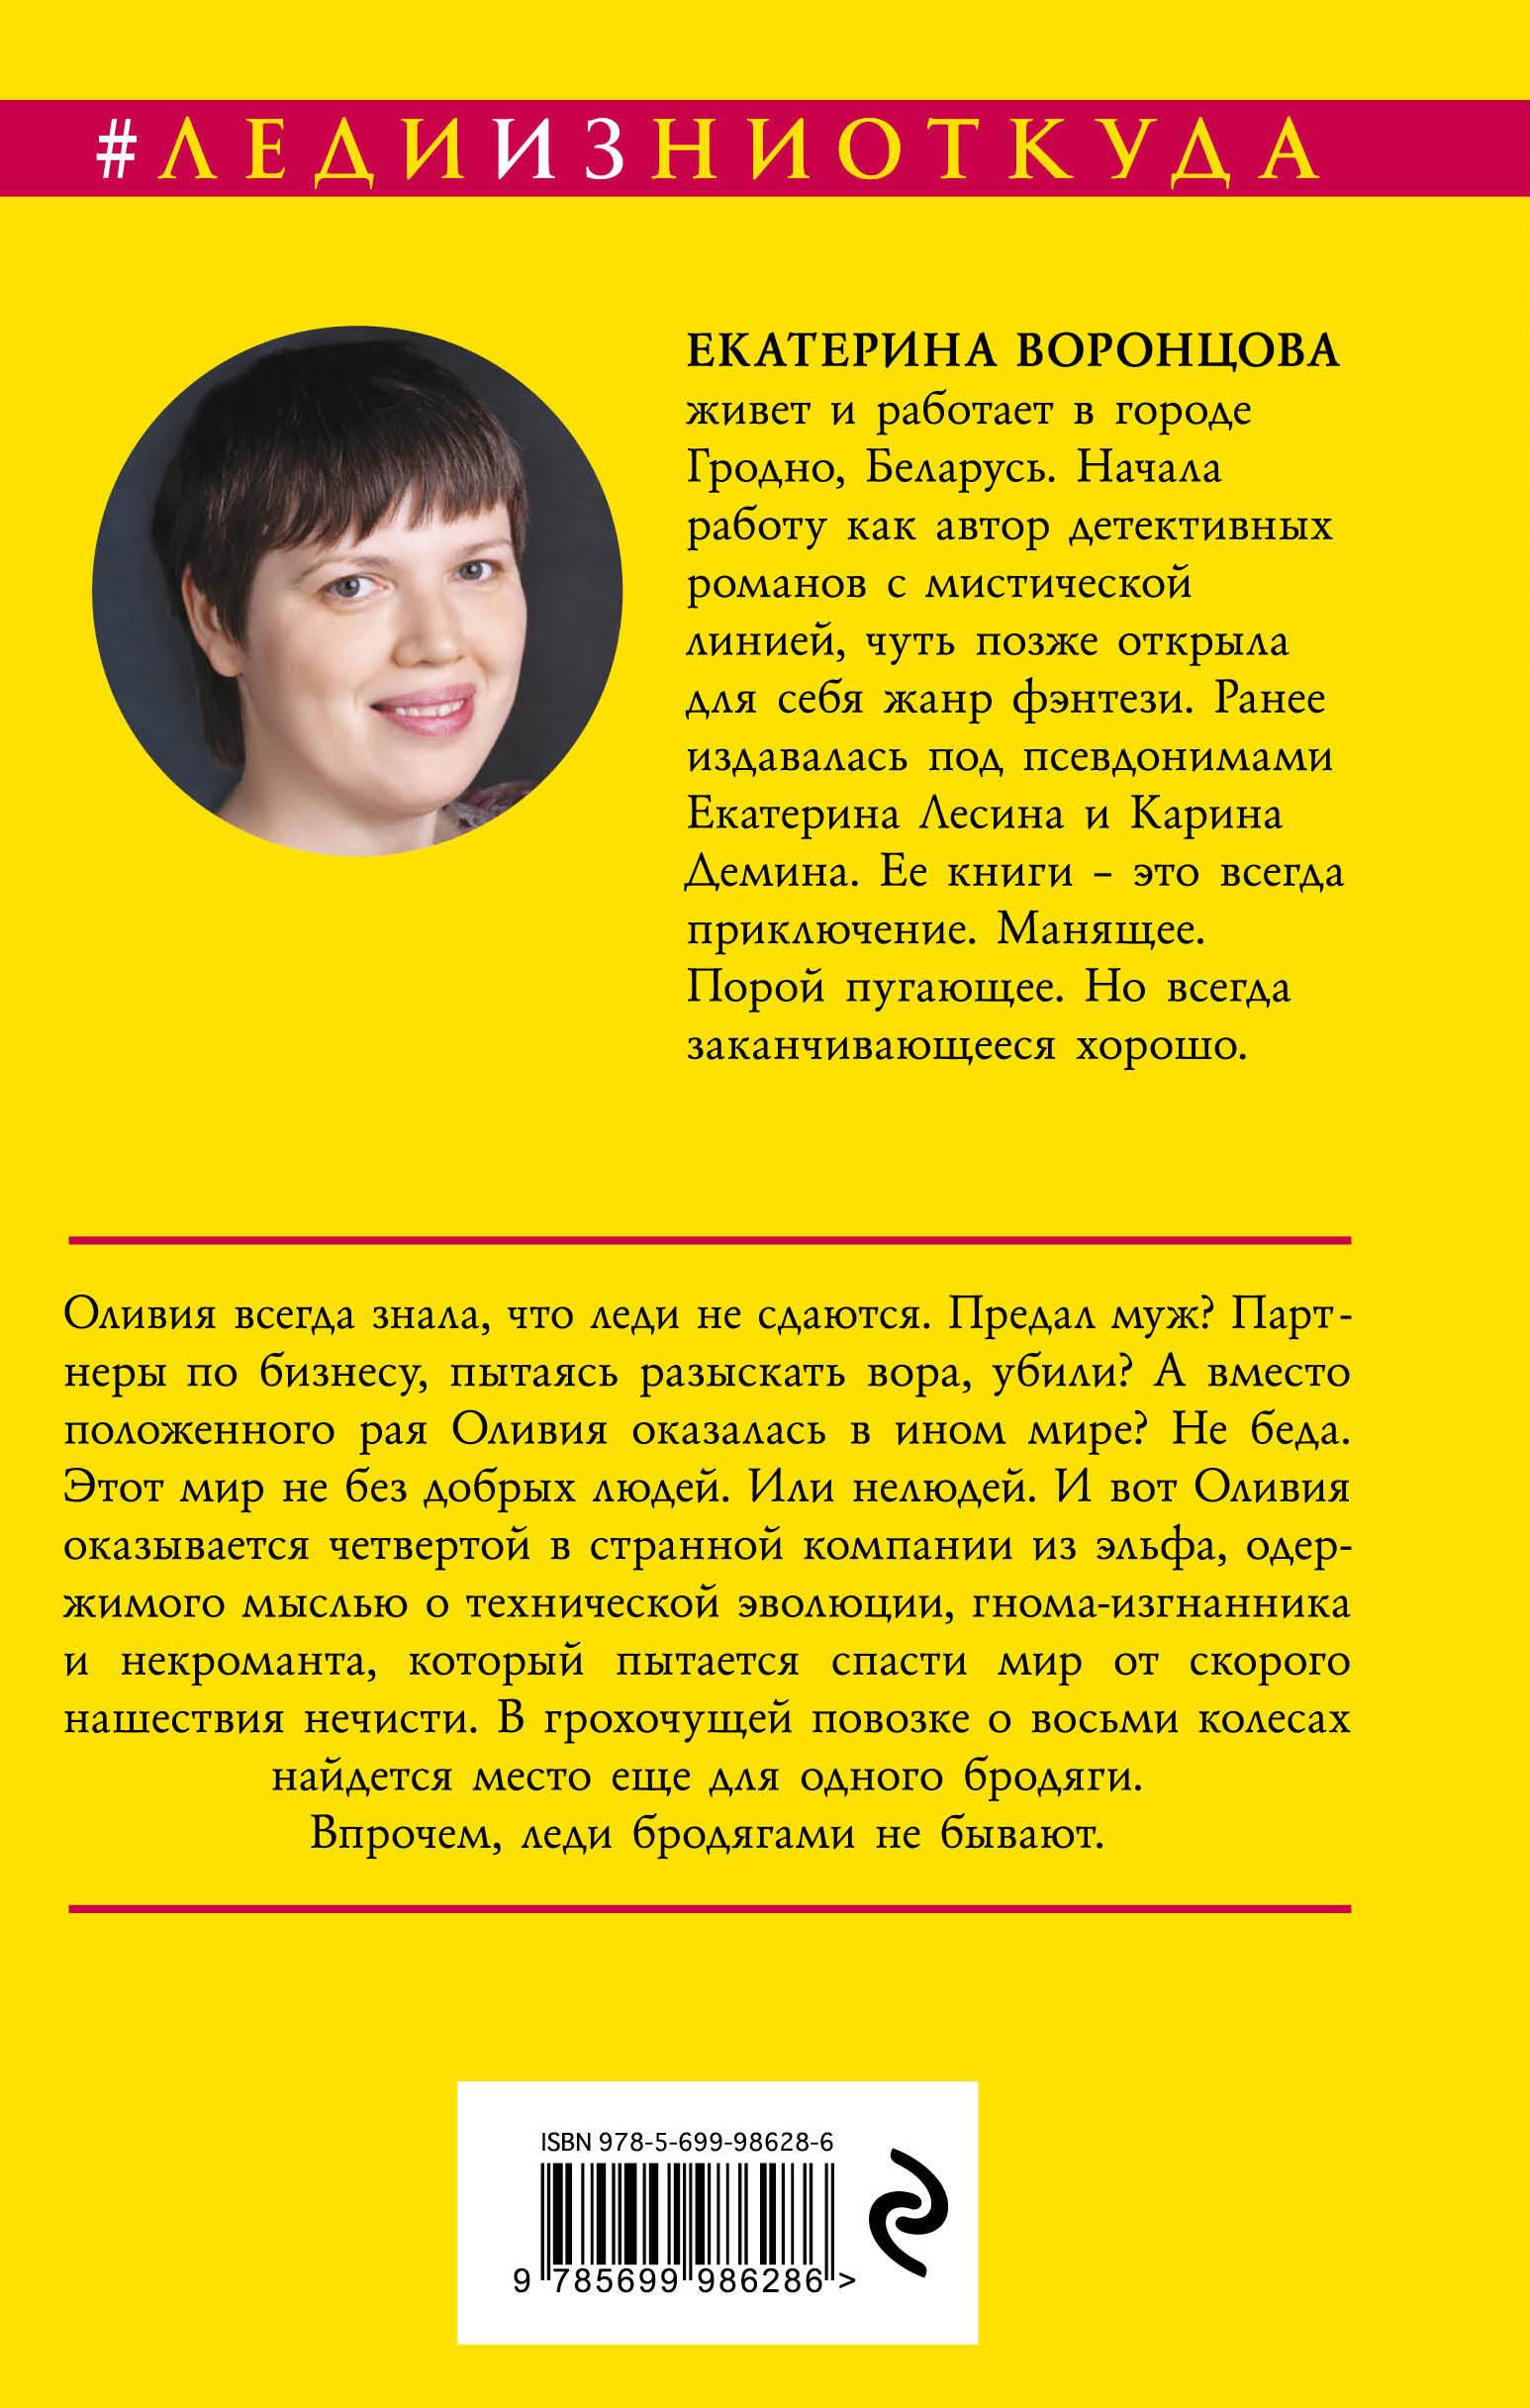 Леди и Некромант. Екатерина Воронцова